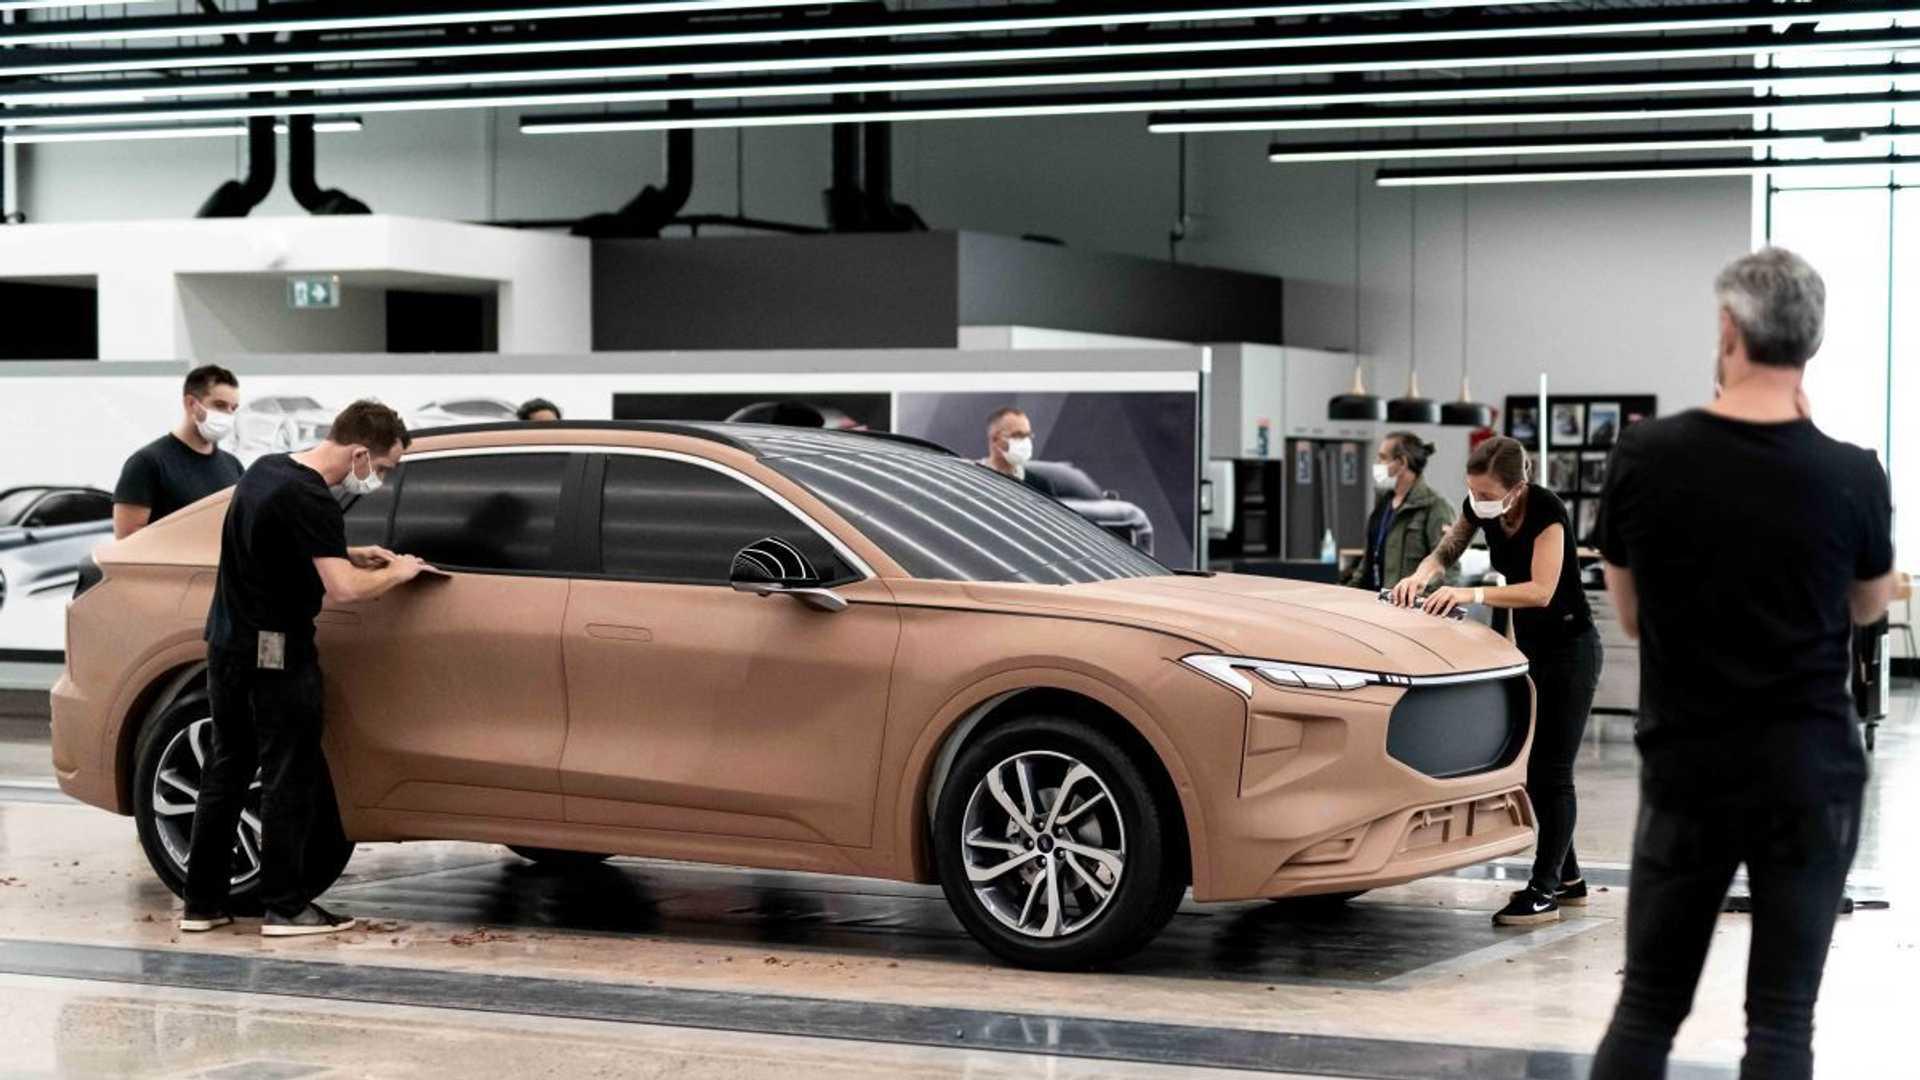 2021-ford-evos-cn.jpeg